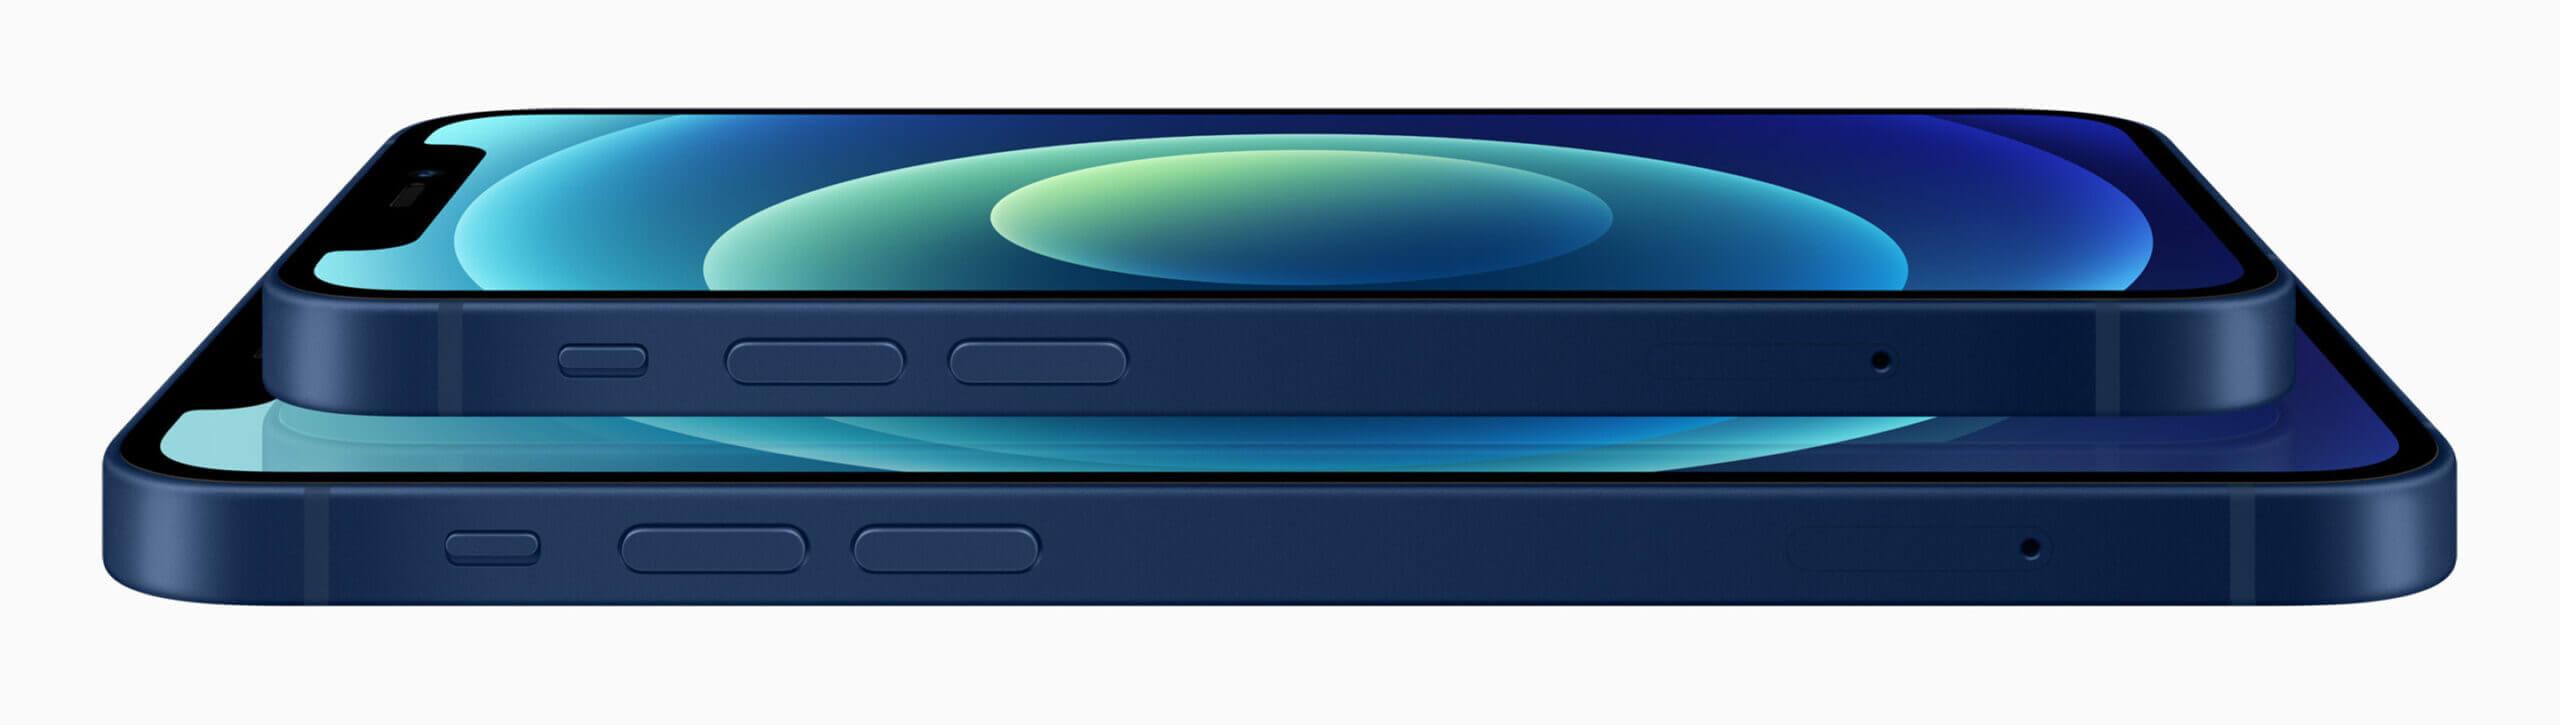 iPhone 12 and 12 Mini